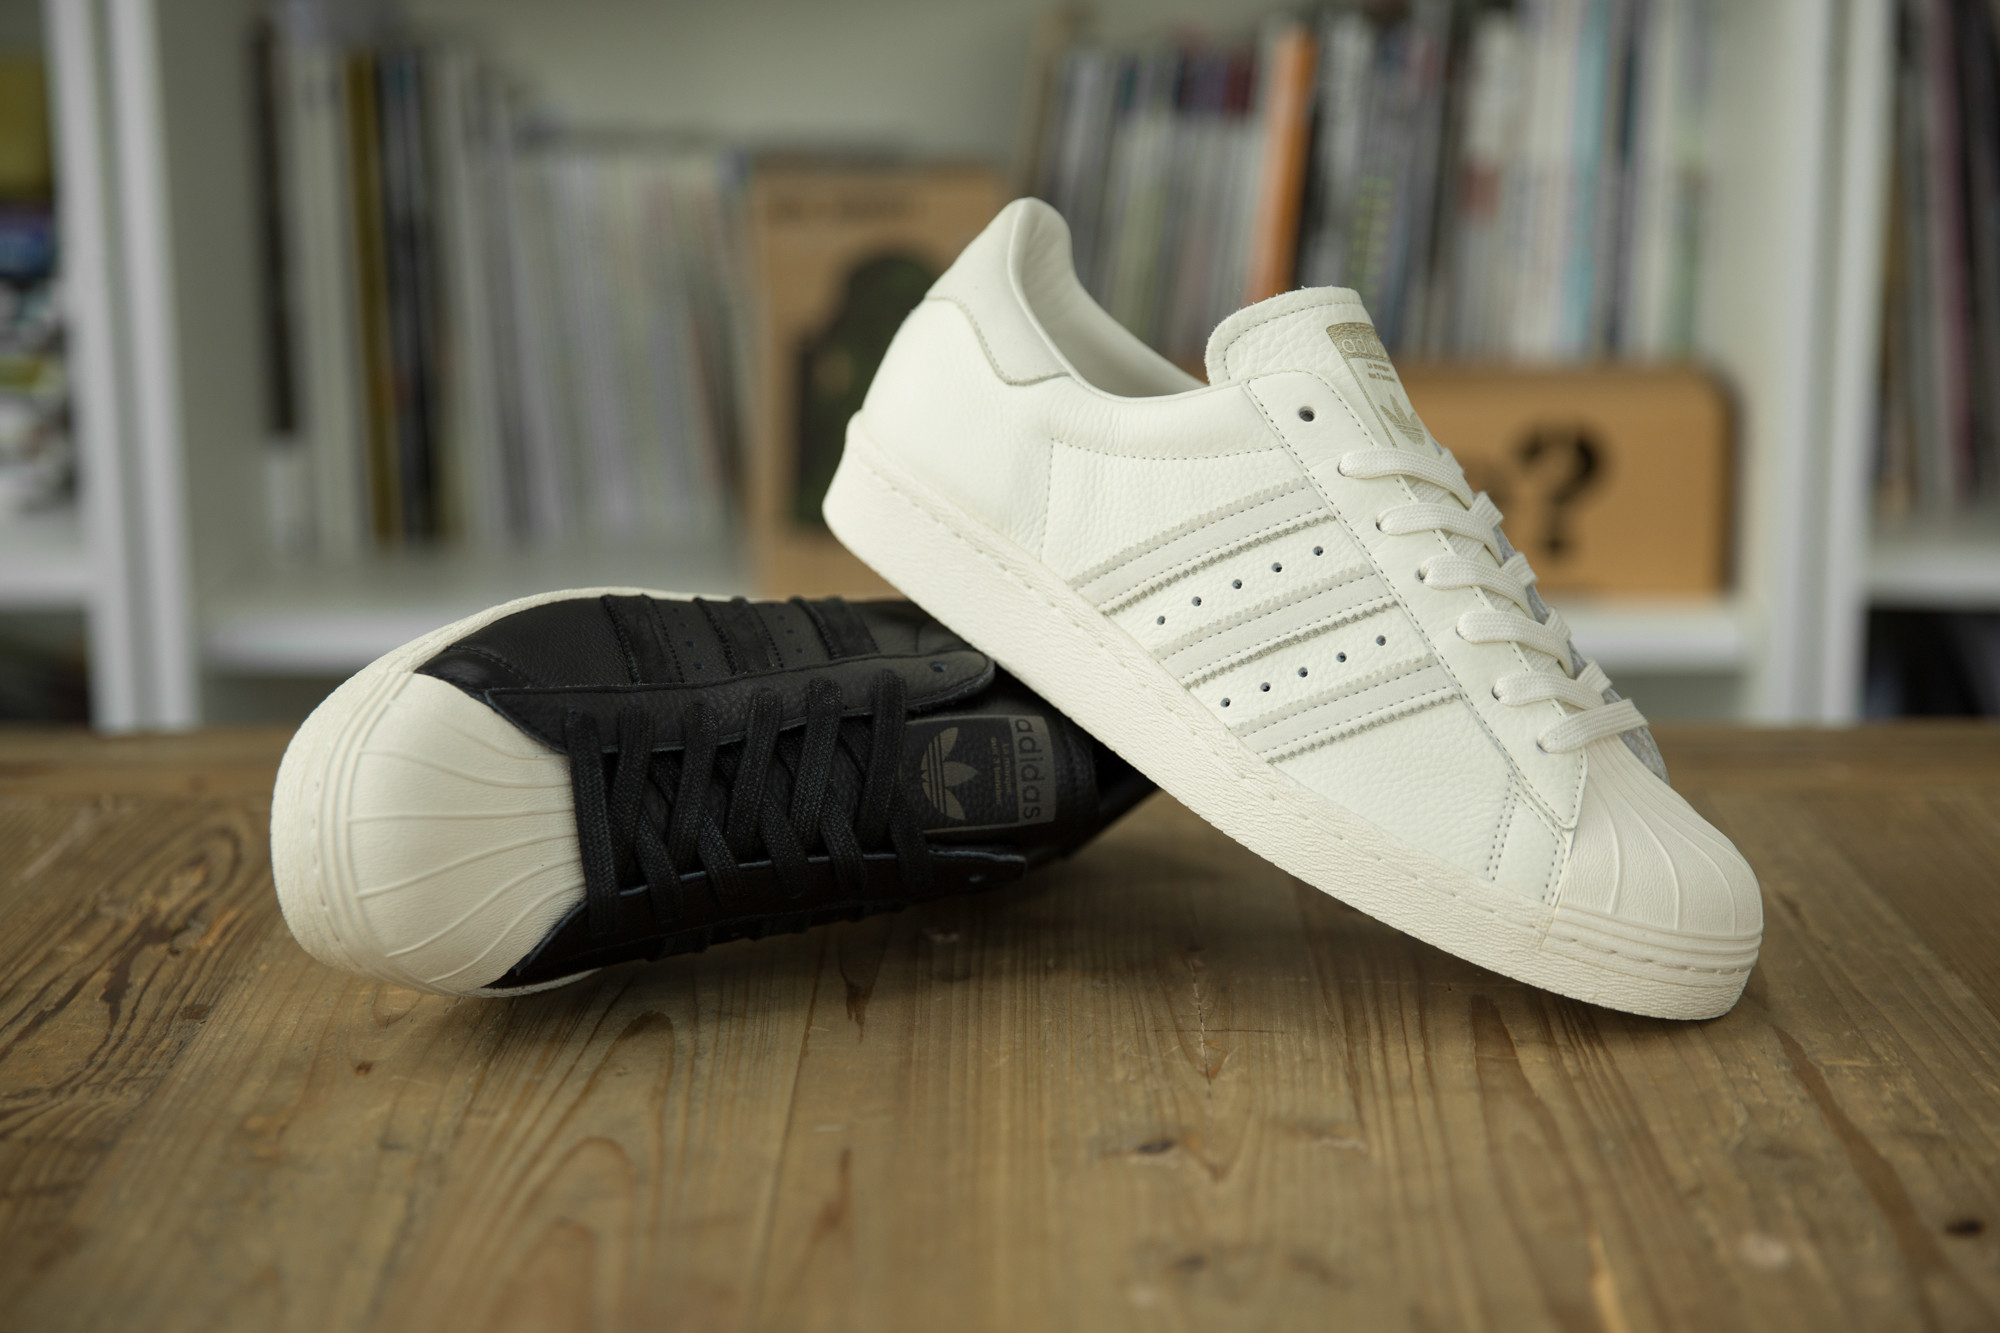 adidas Originals Superstar 80s size Retailer